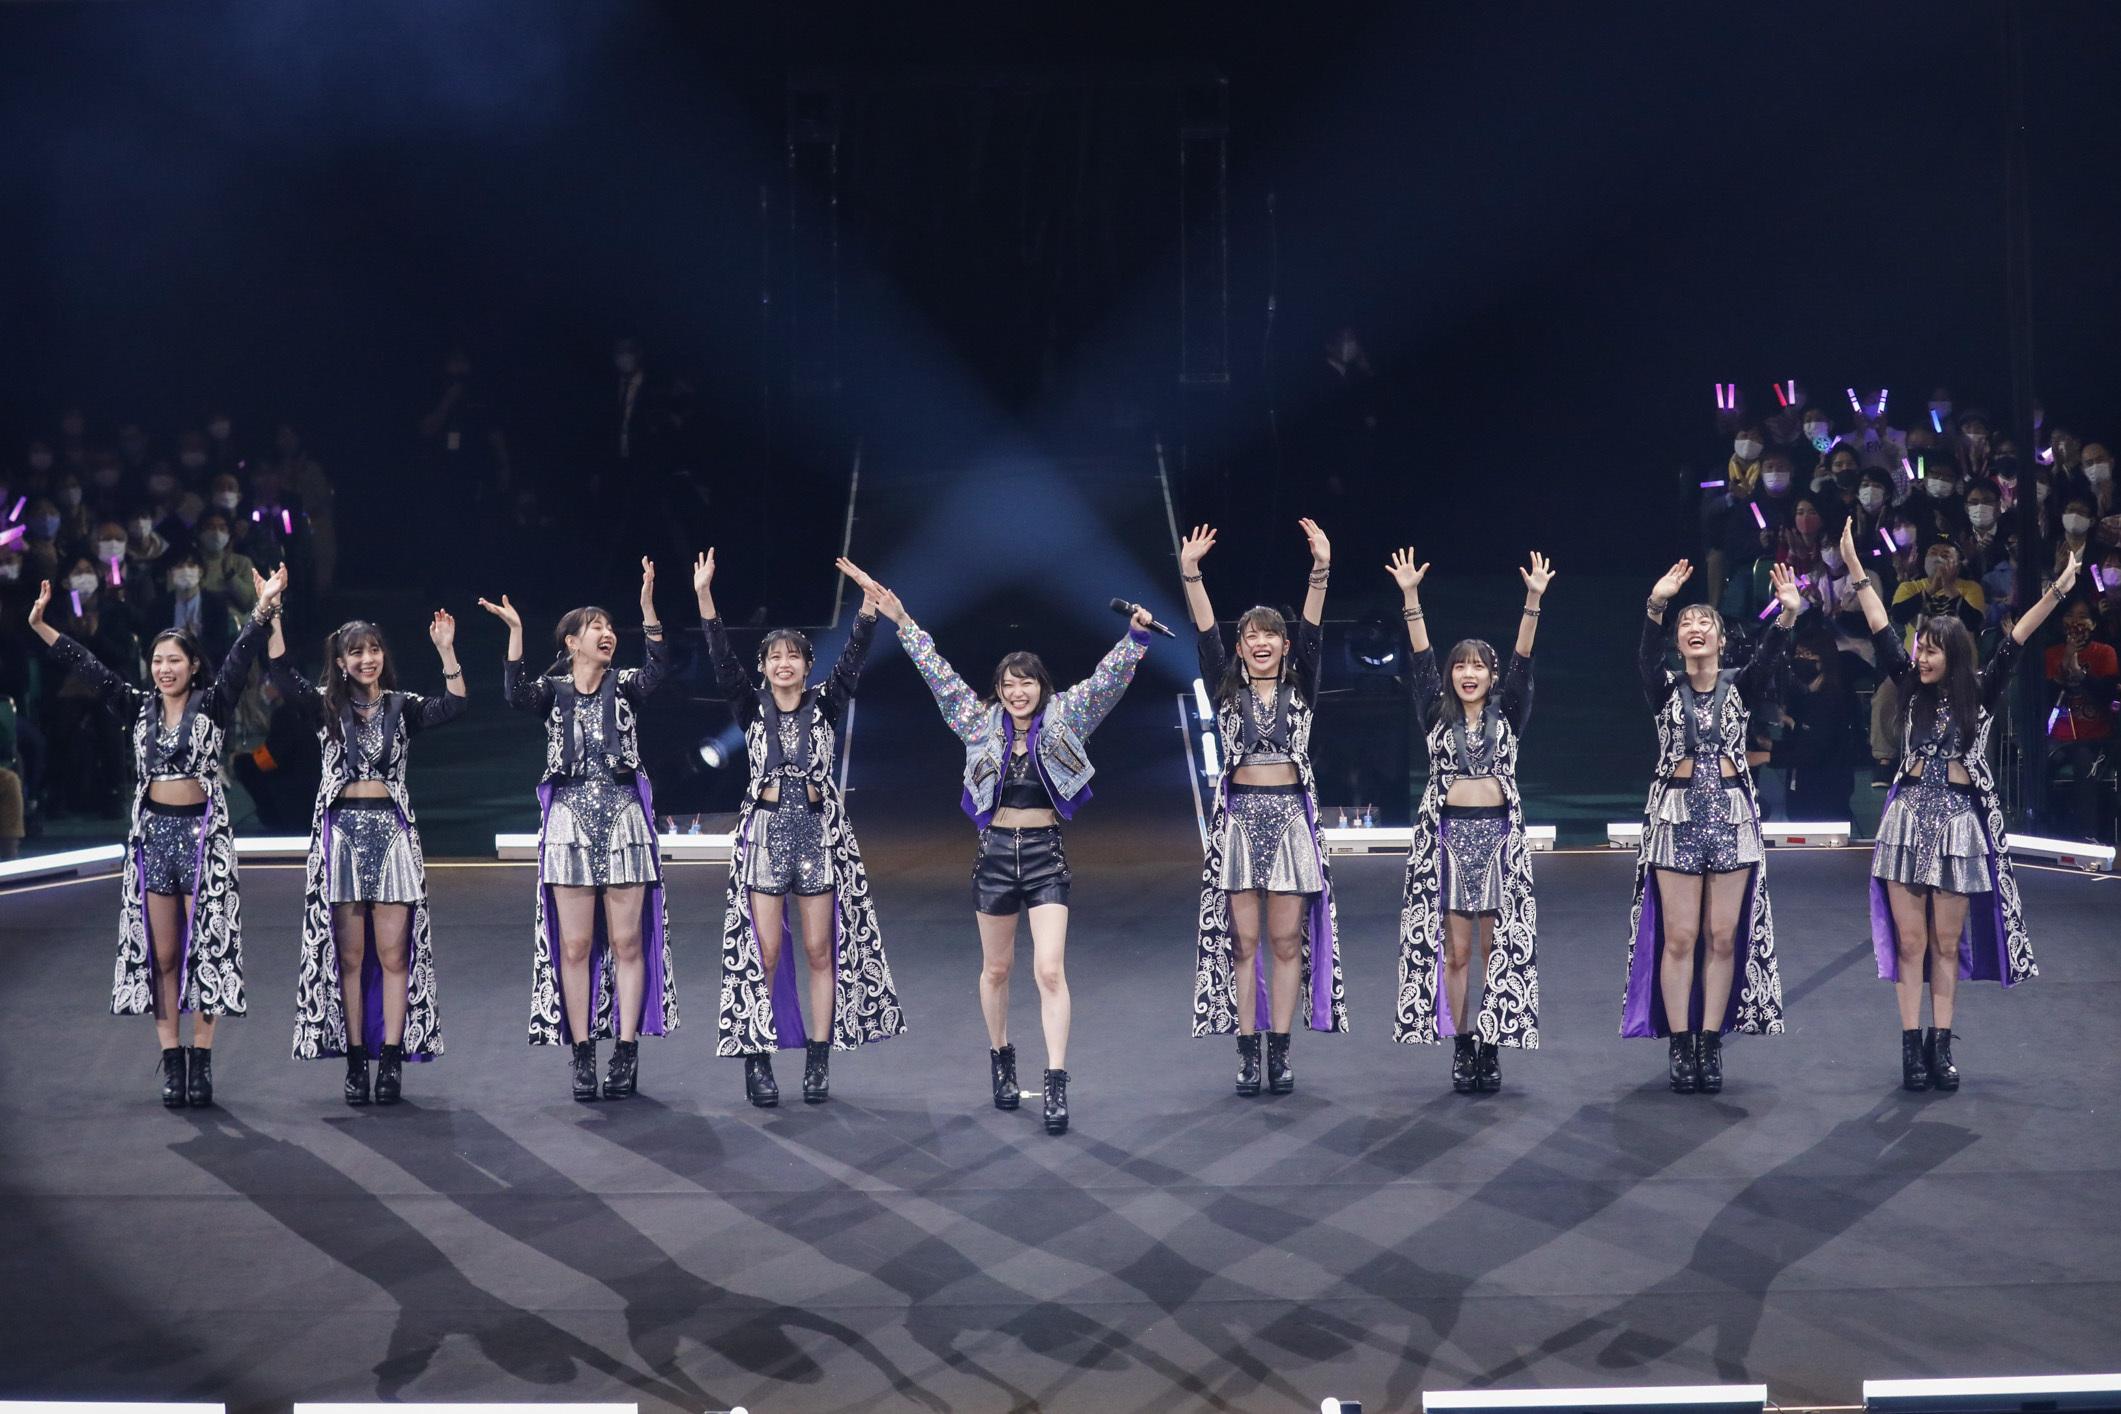 『Juice=Juice コンサート 2020 〜続いていく STORY〜 宮本佳林卒業スペシャル』 カット写真